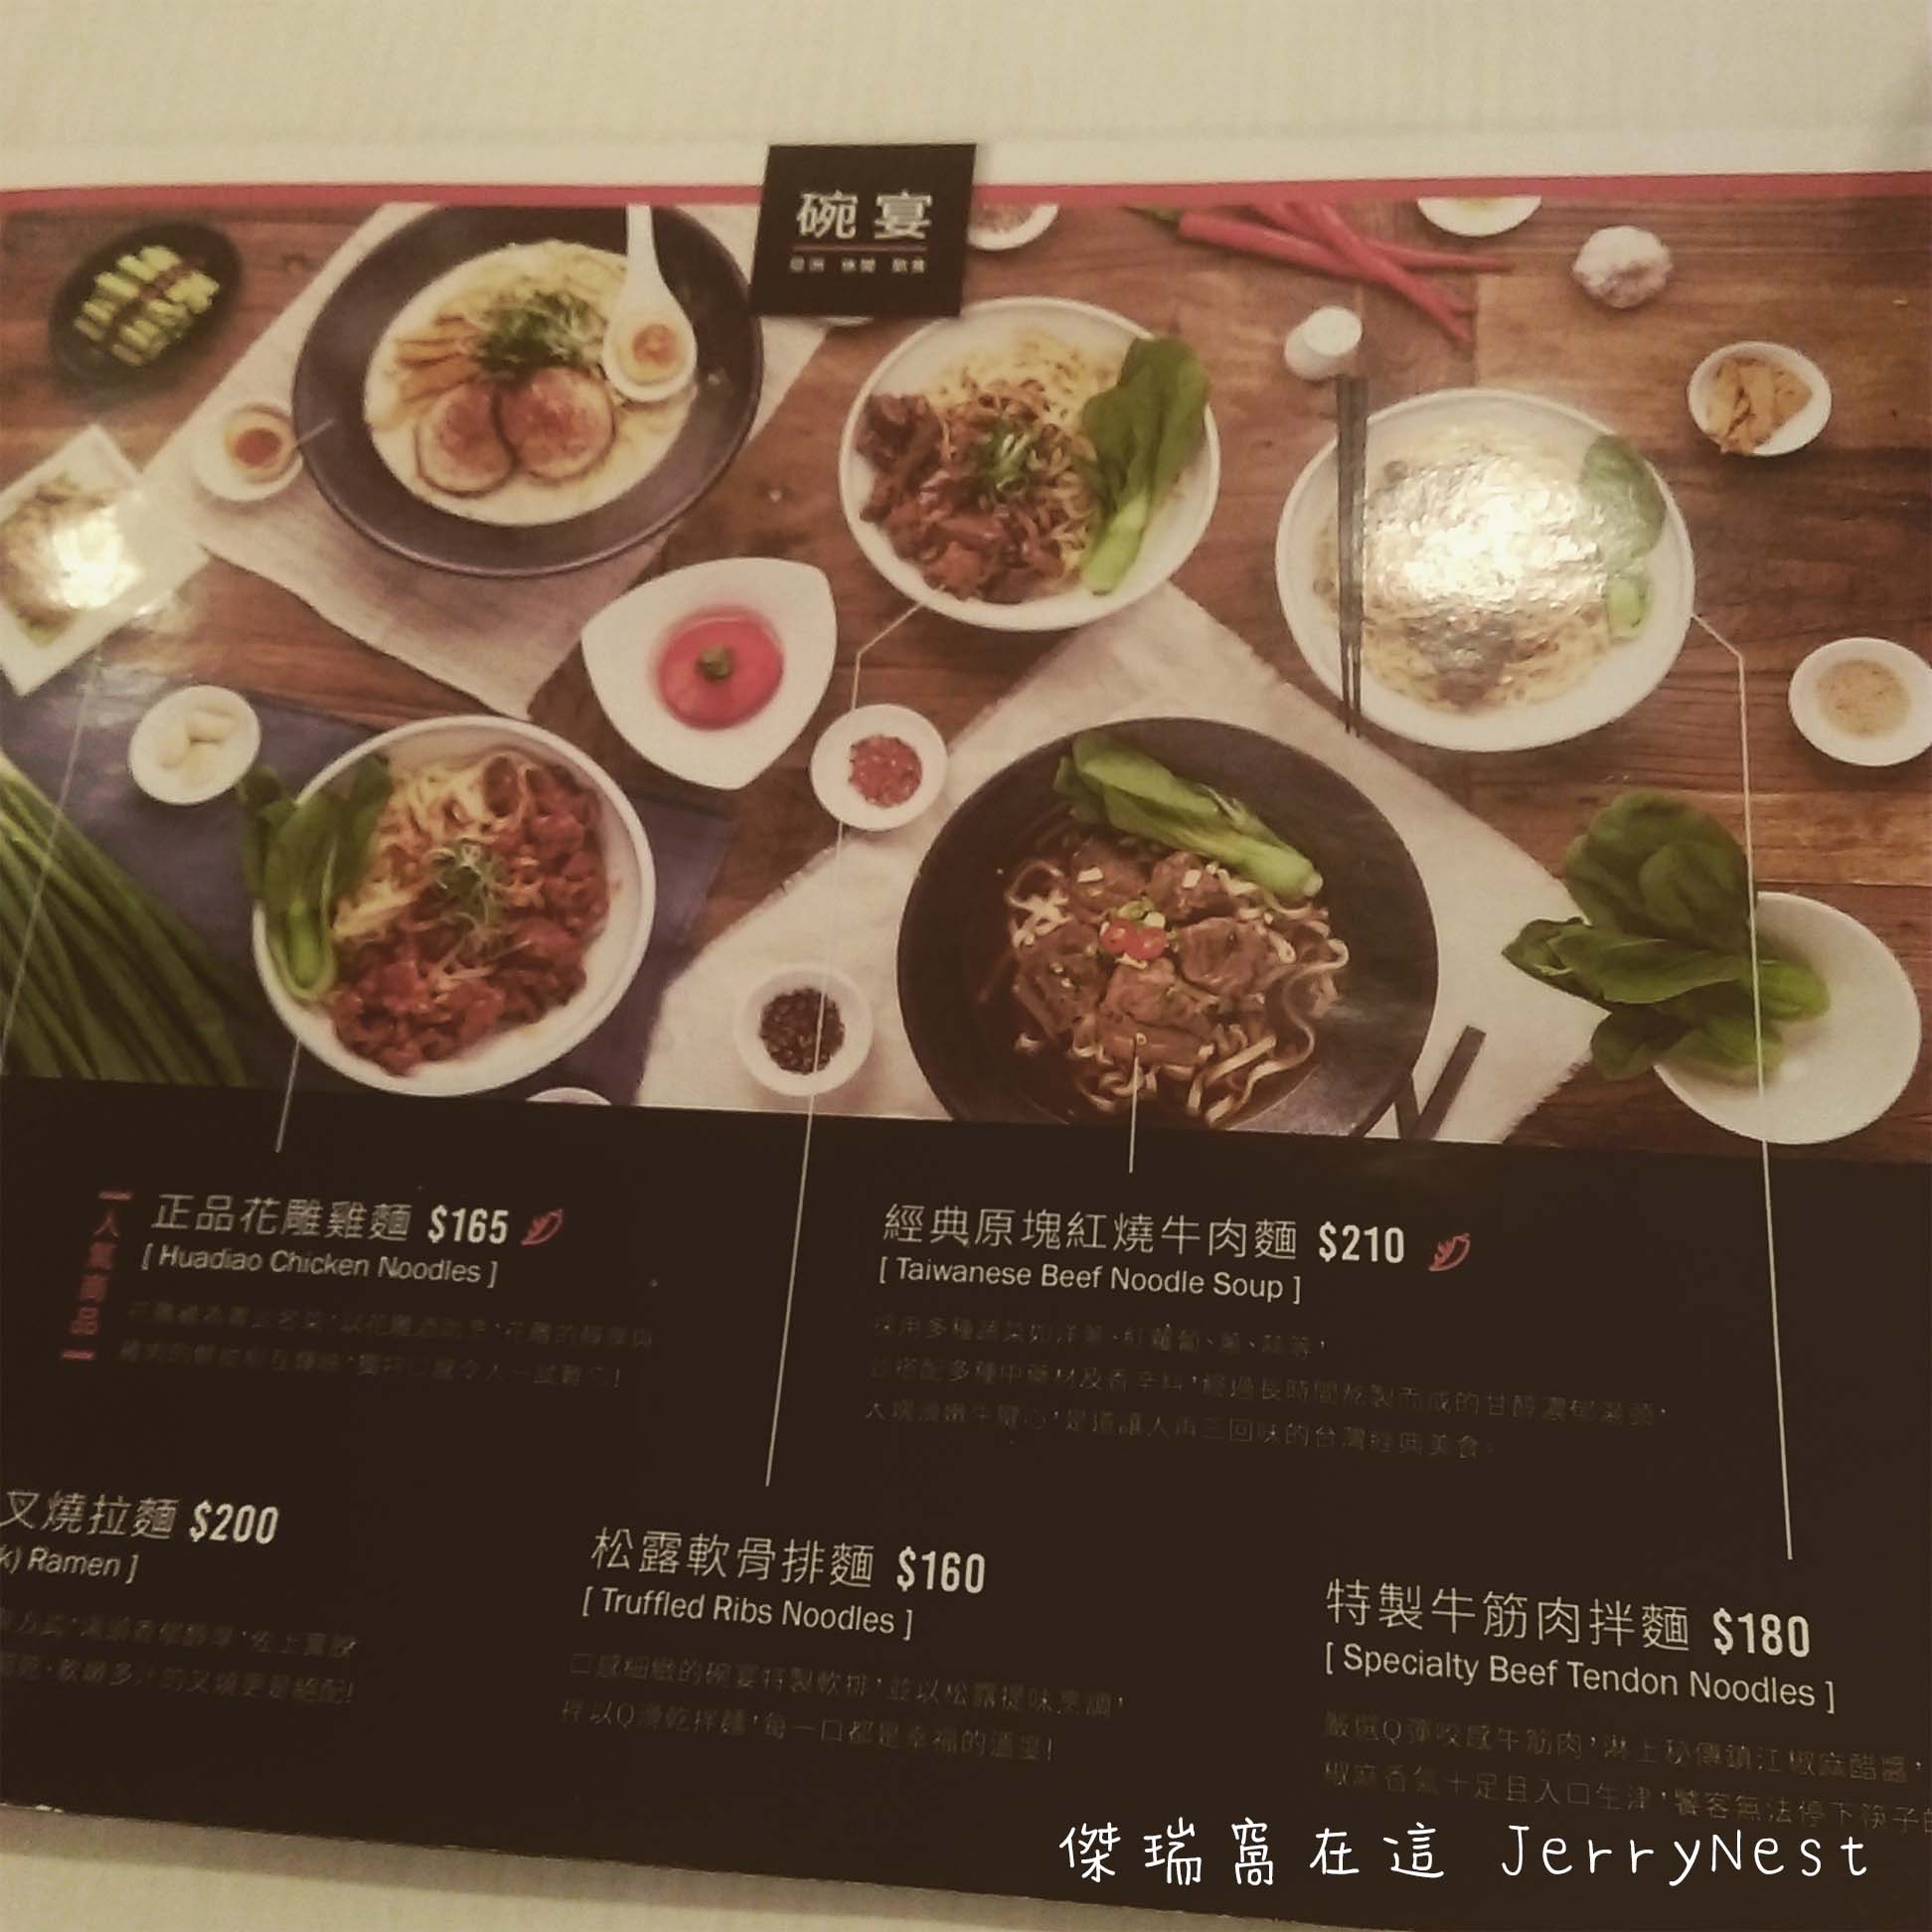 bb8 - 台北微風廣場|用碗喝飲料的亞洲特色餐廳 碗宴 Bowl Room